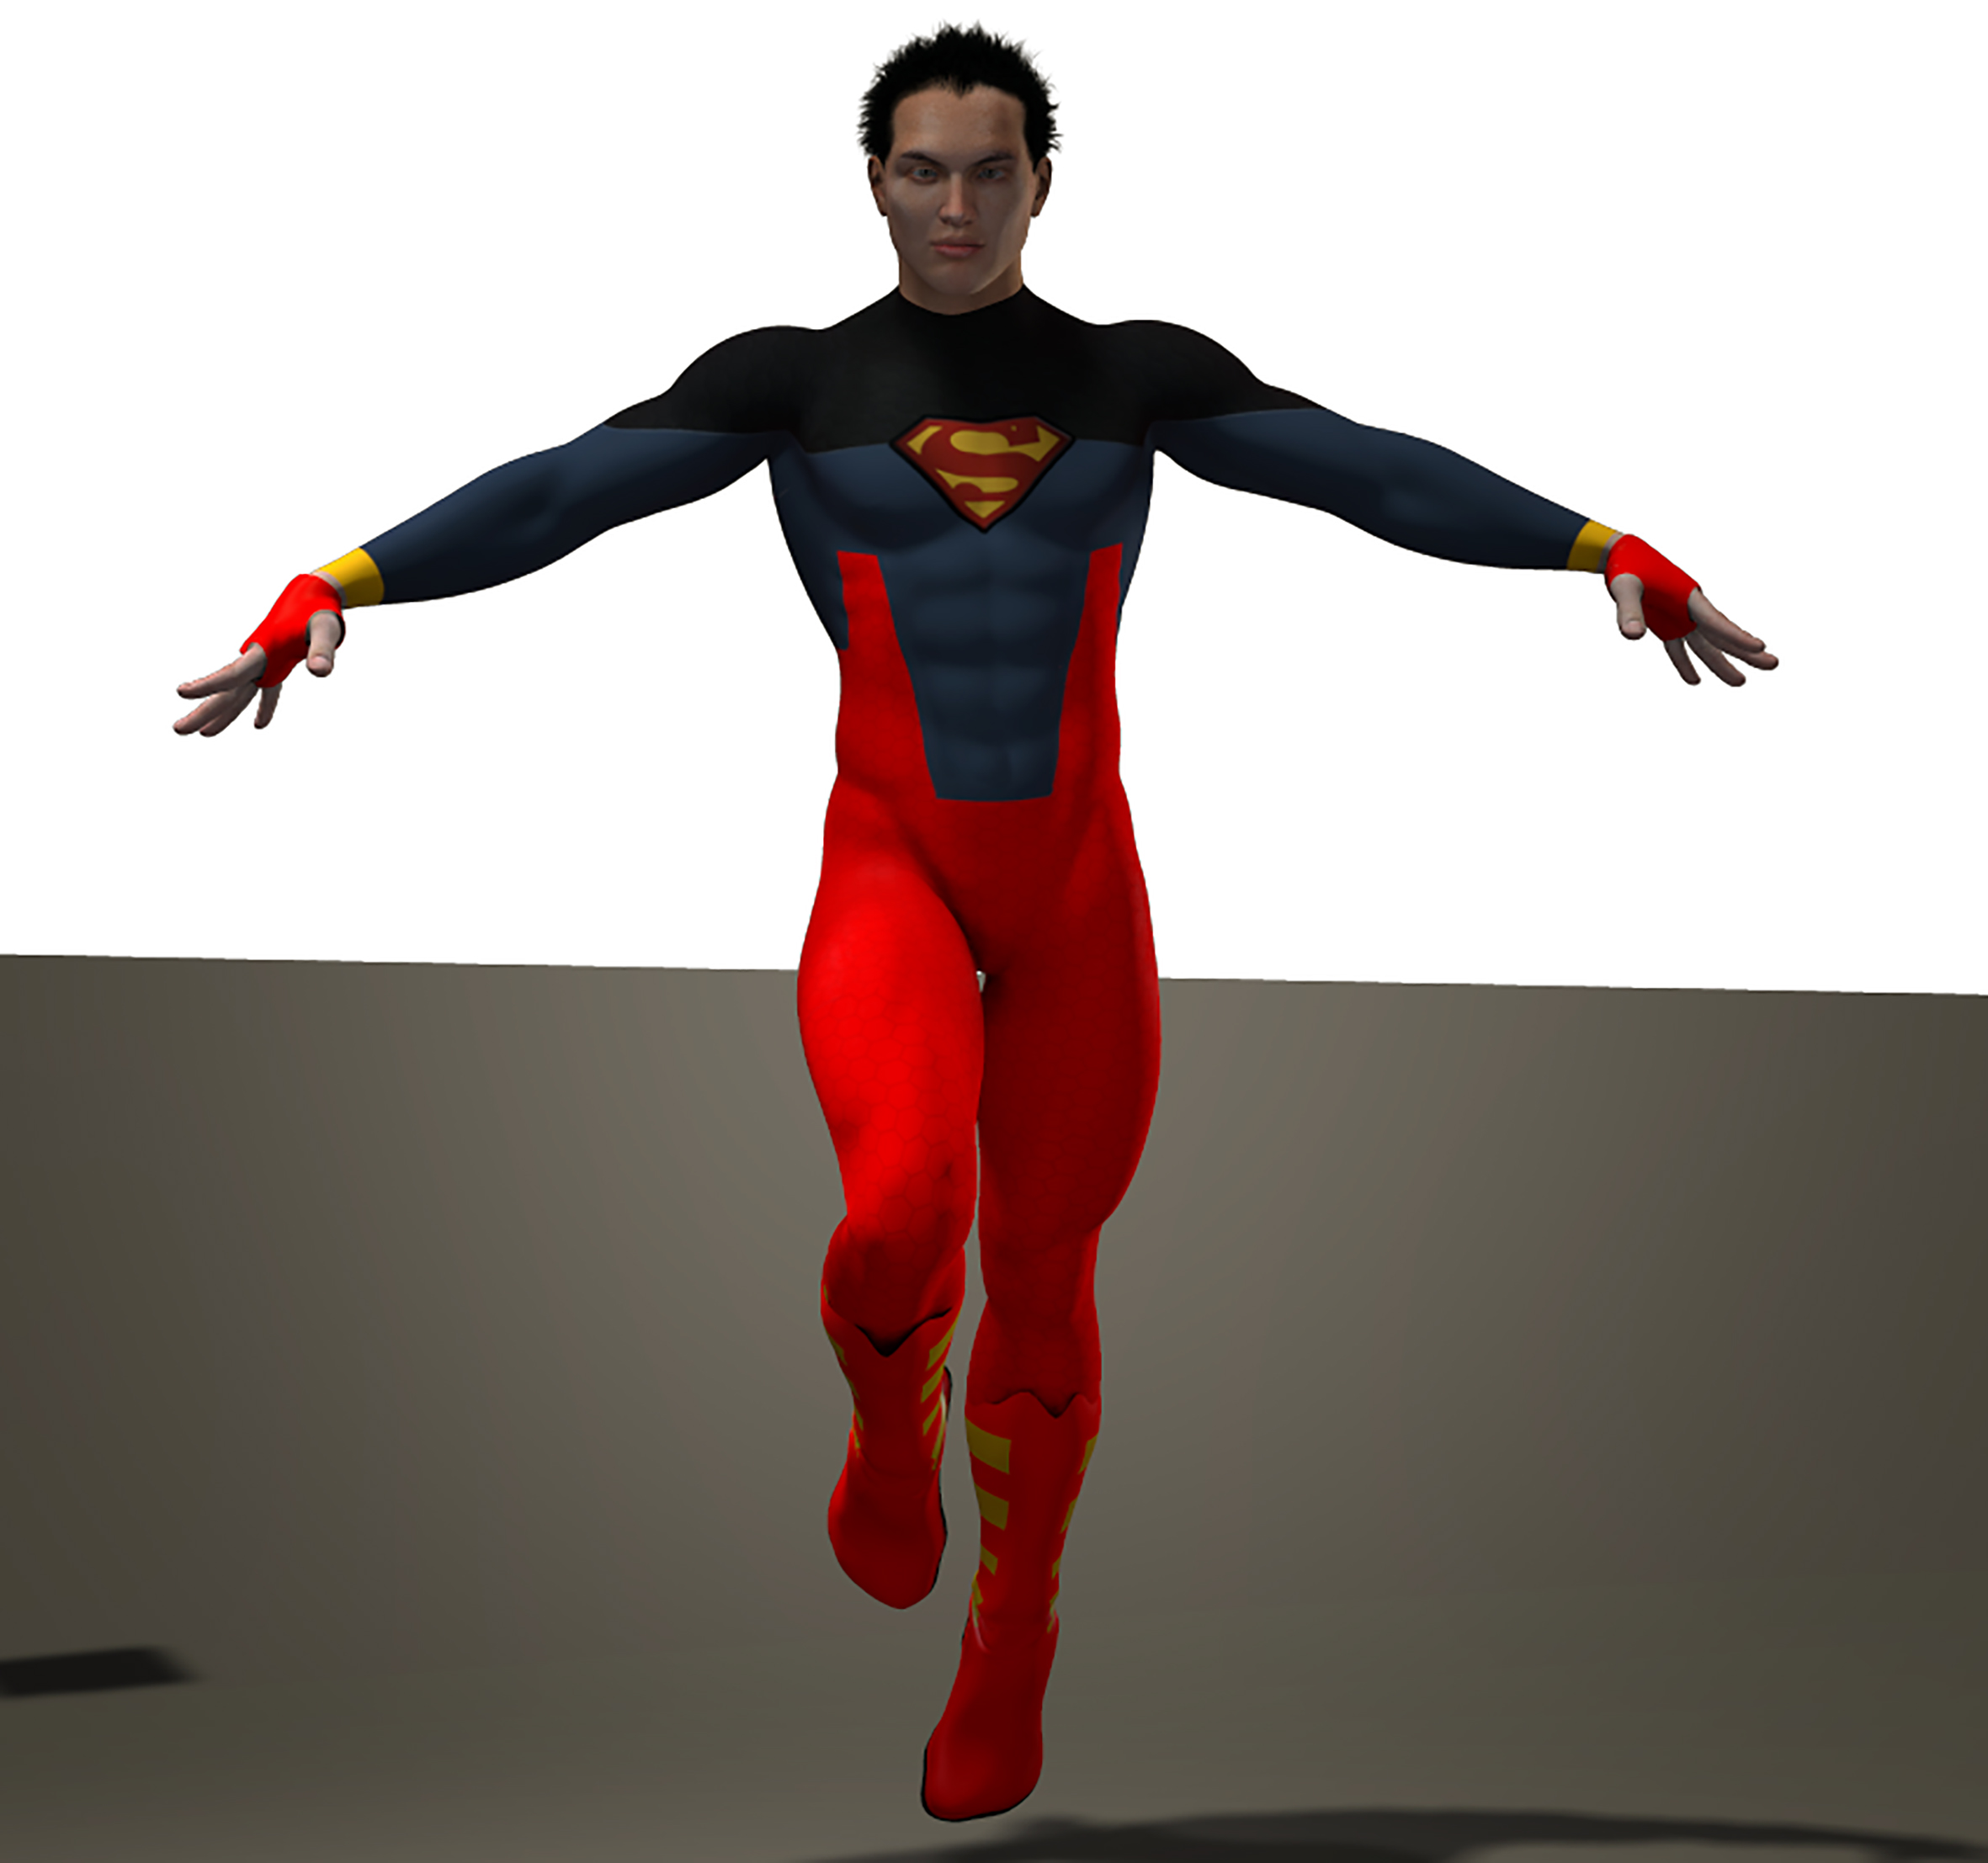 Superboy second skin textures for M4